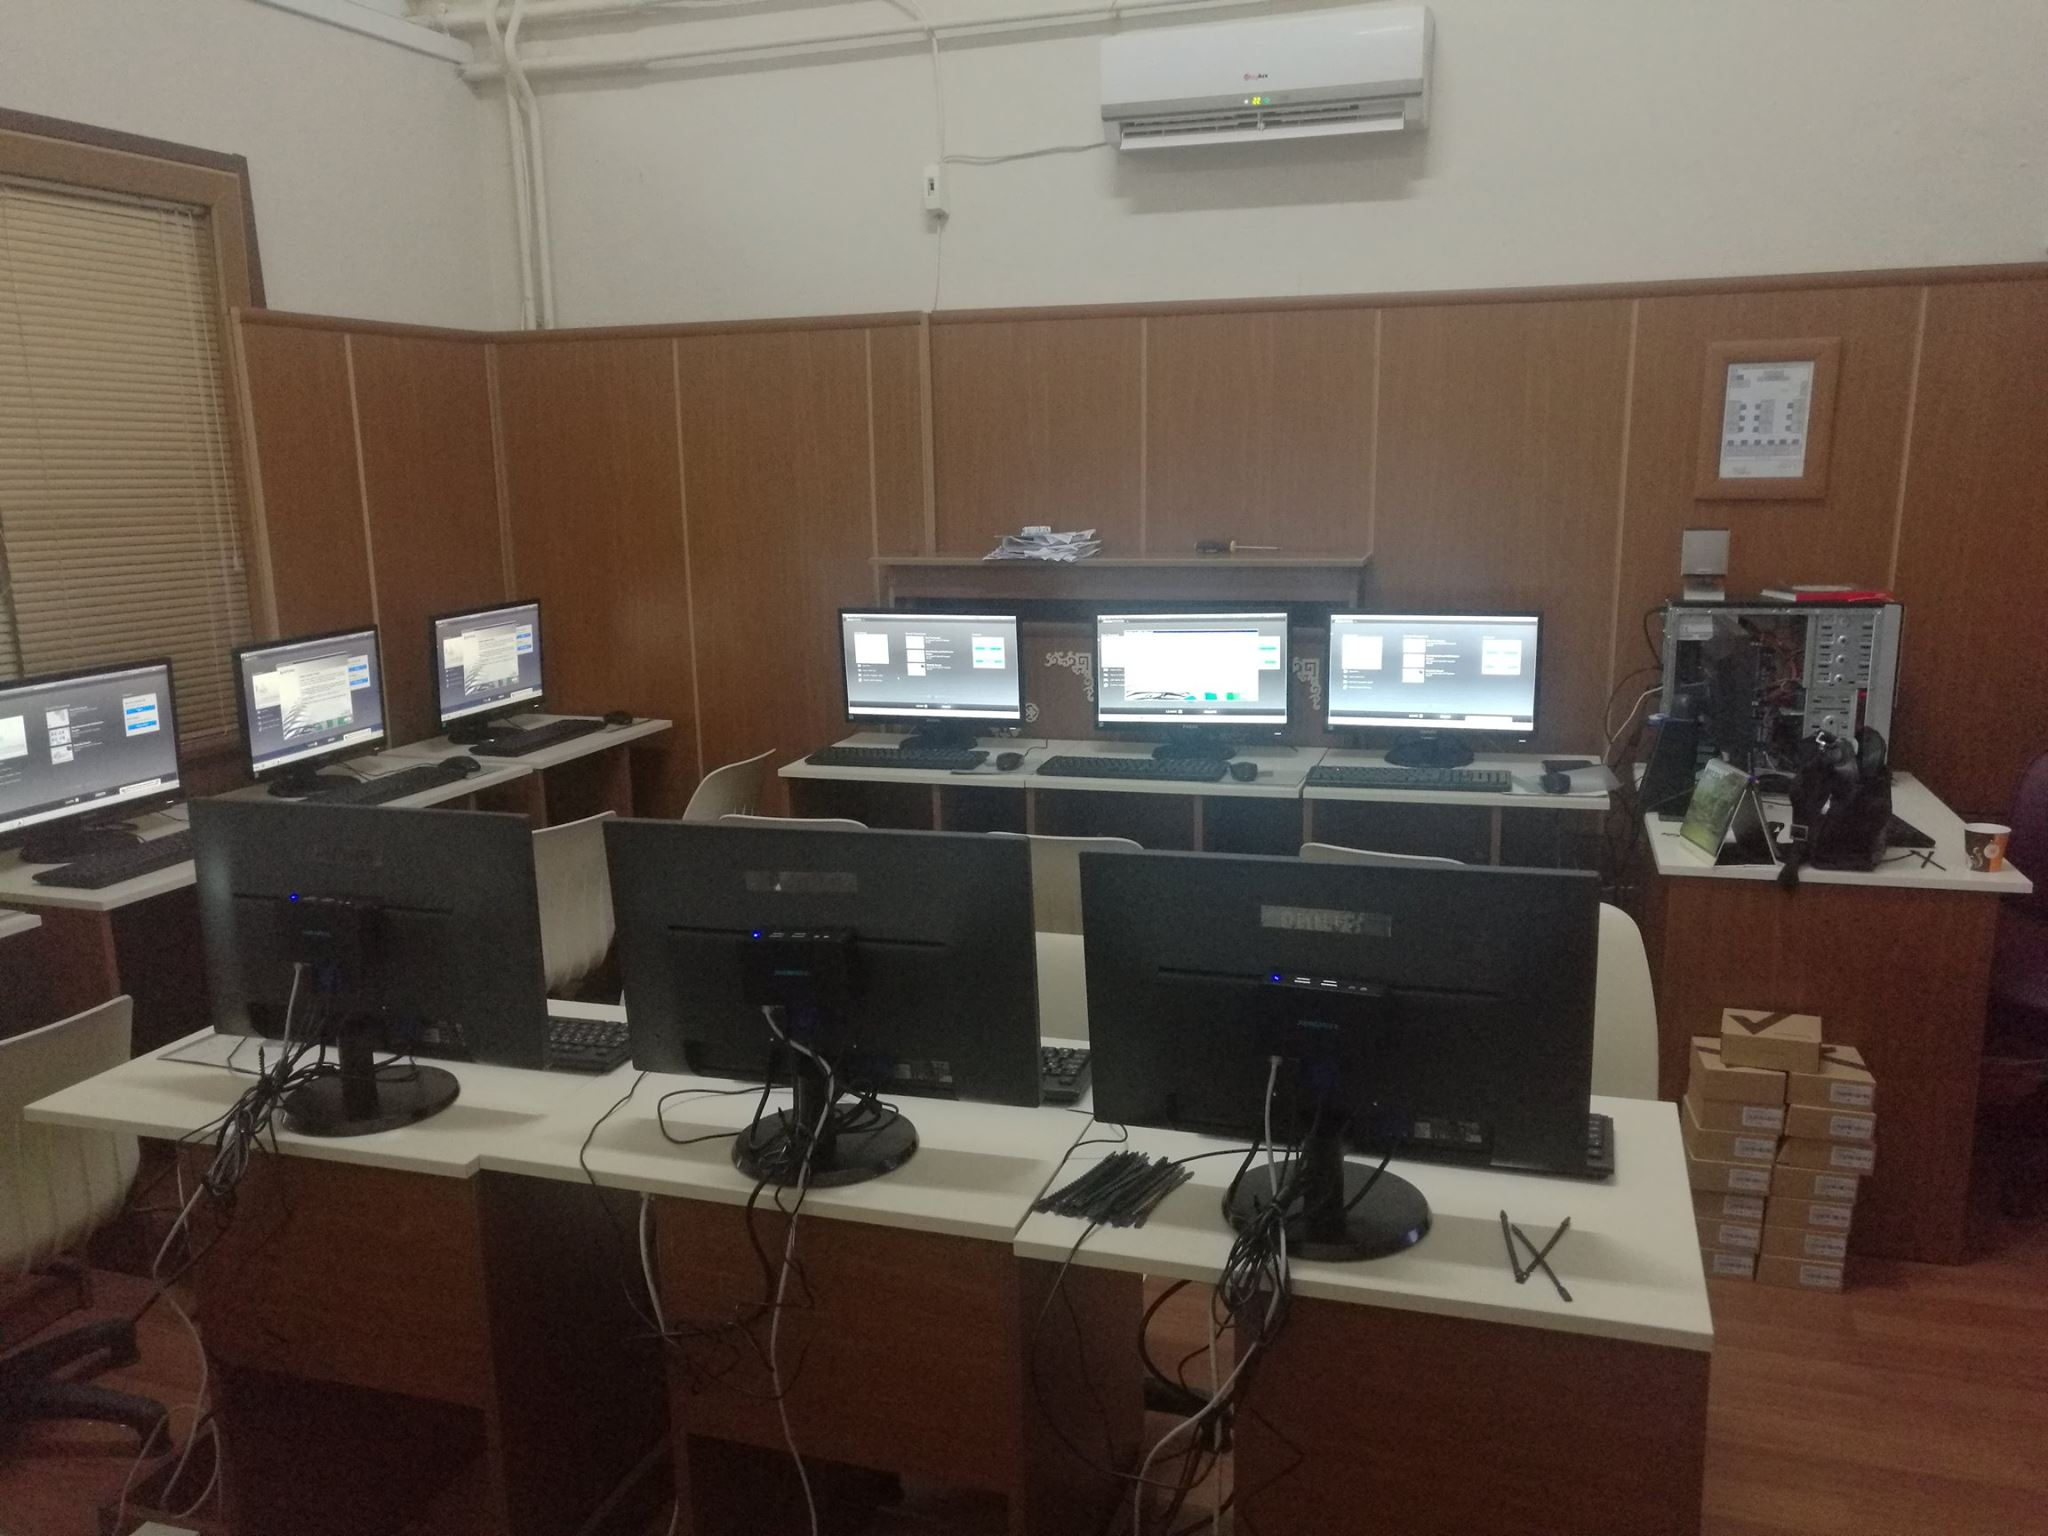 Kadirga-Vocational-Technical-And-Anatolian-High-School-In-Turkey3.jpg